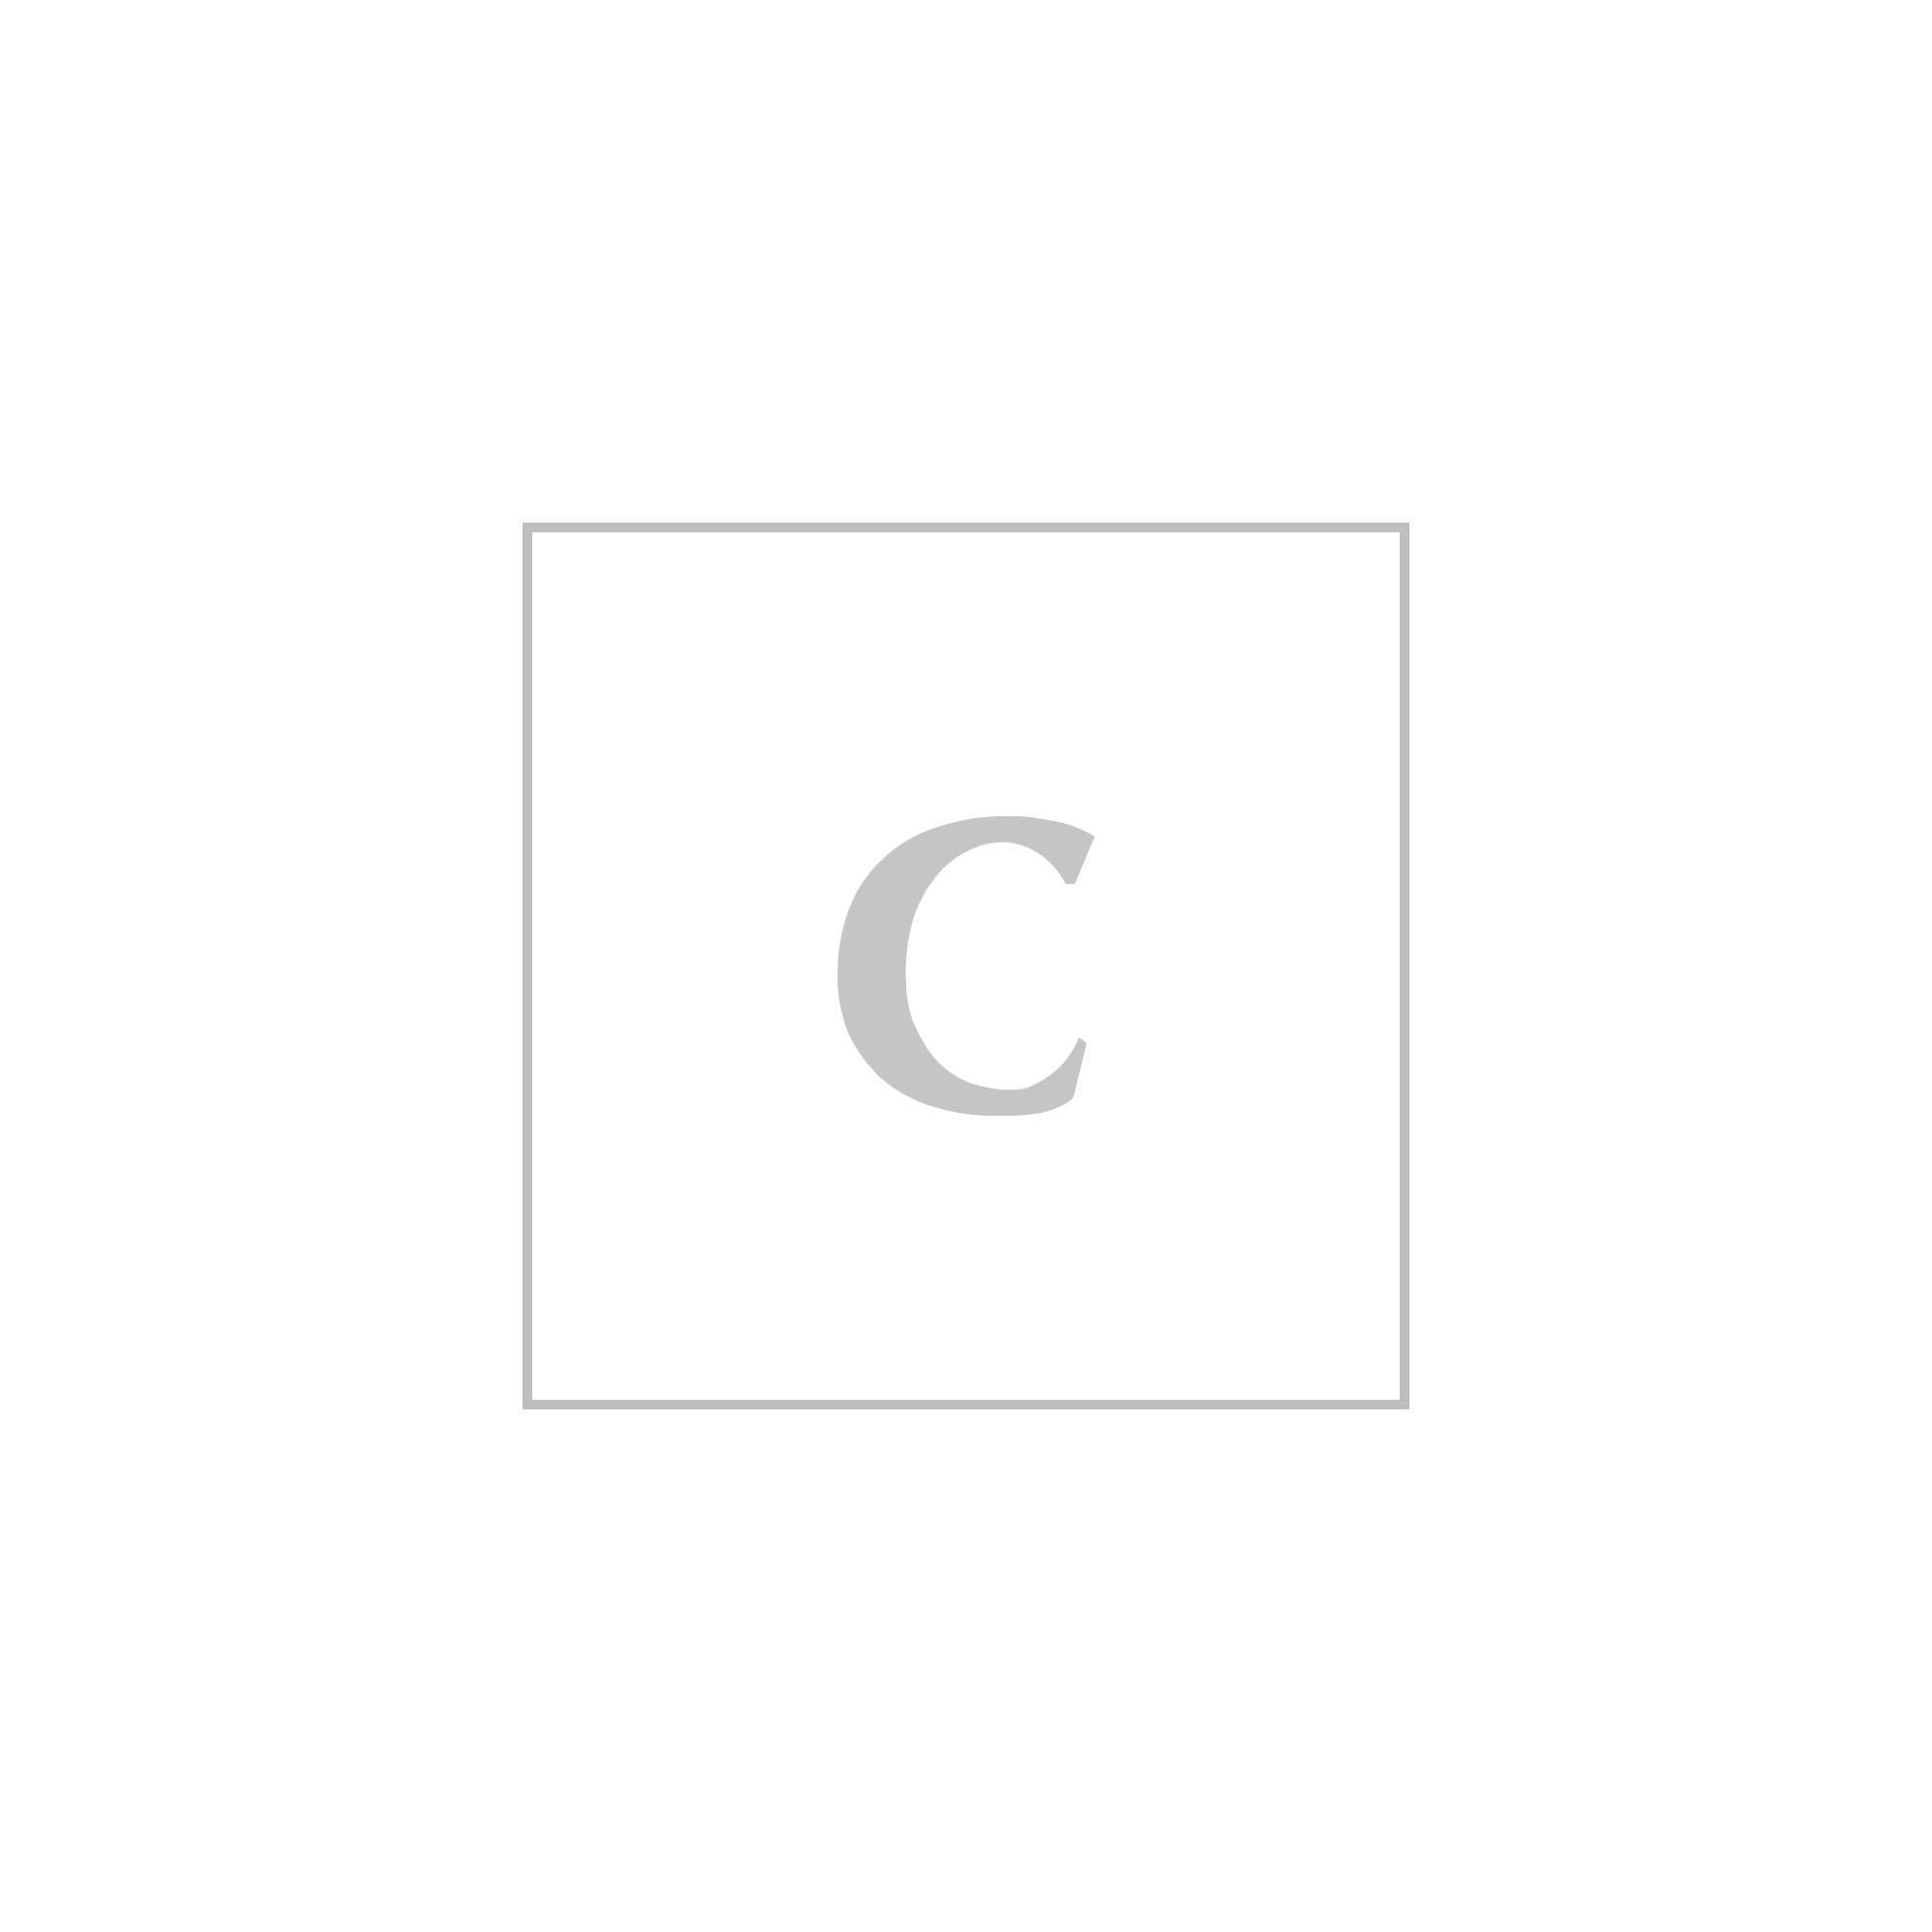 Saint laurent small dylan monogram bag